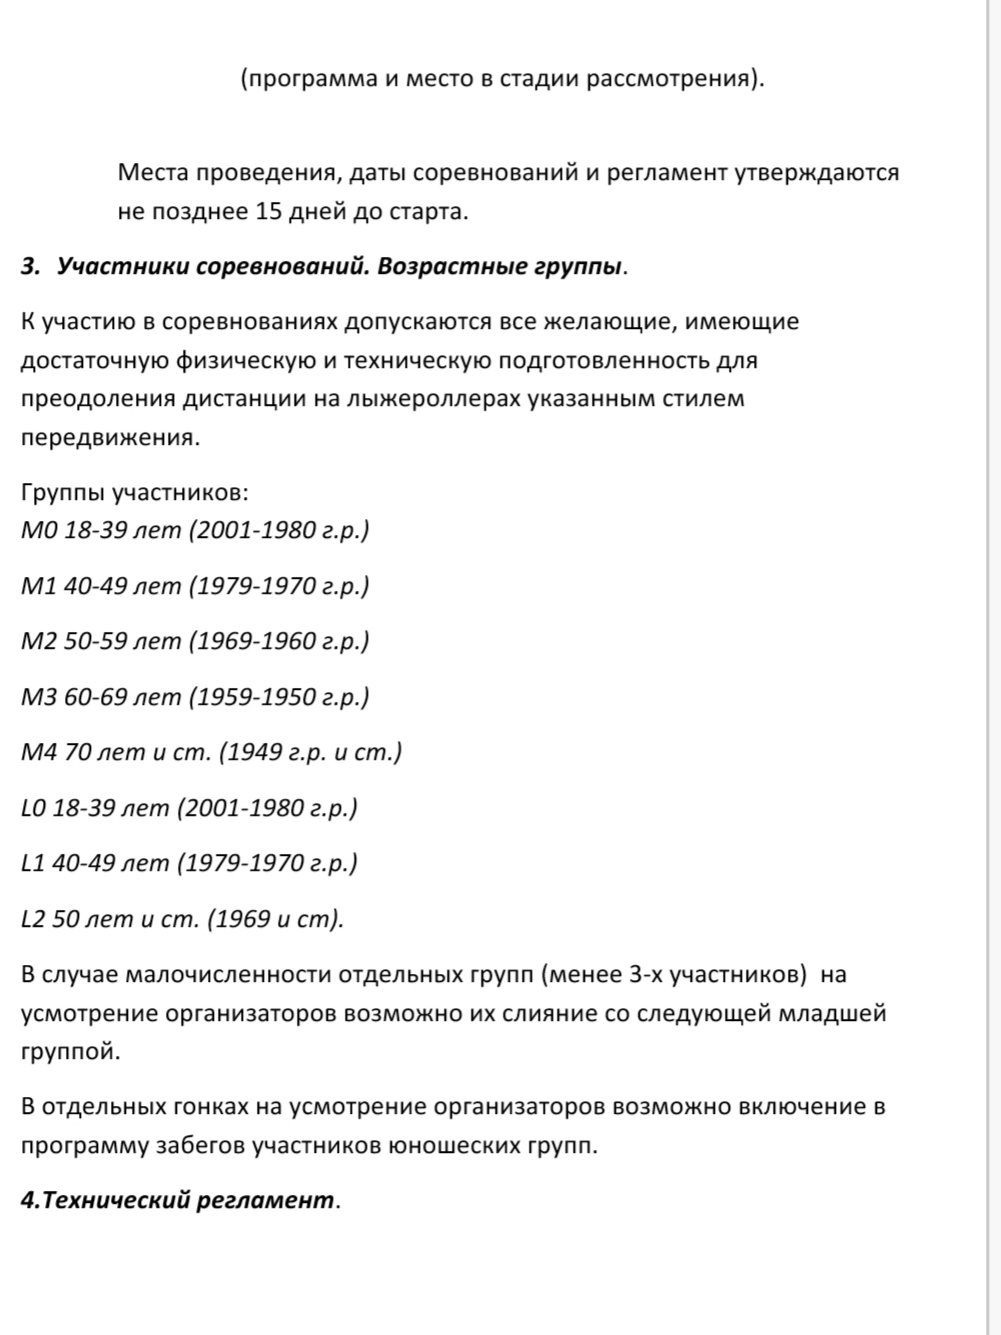 IMG_20200312_182944